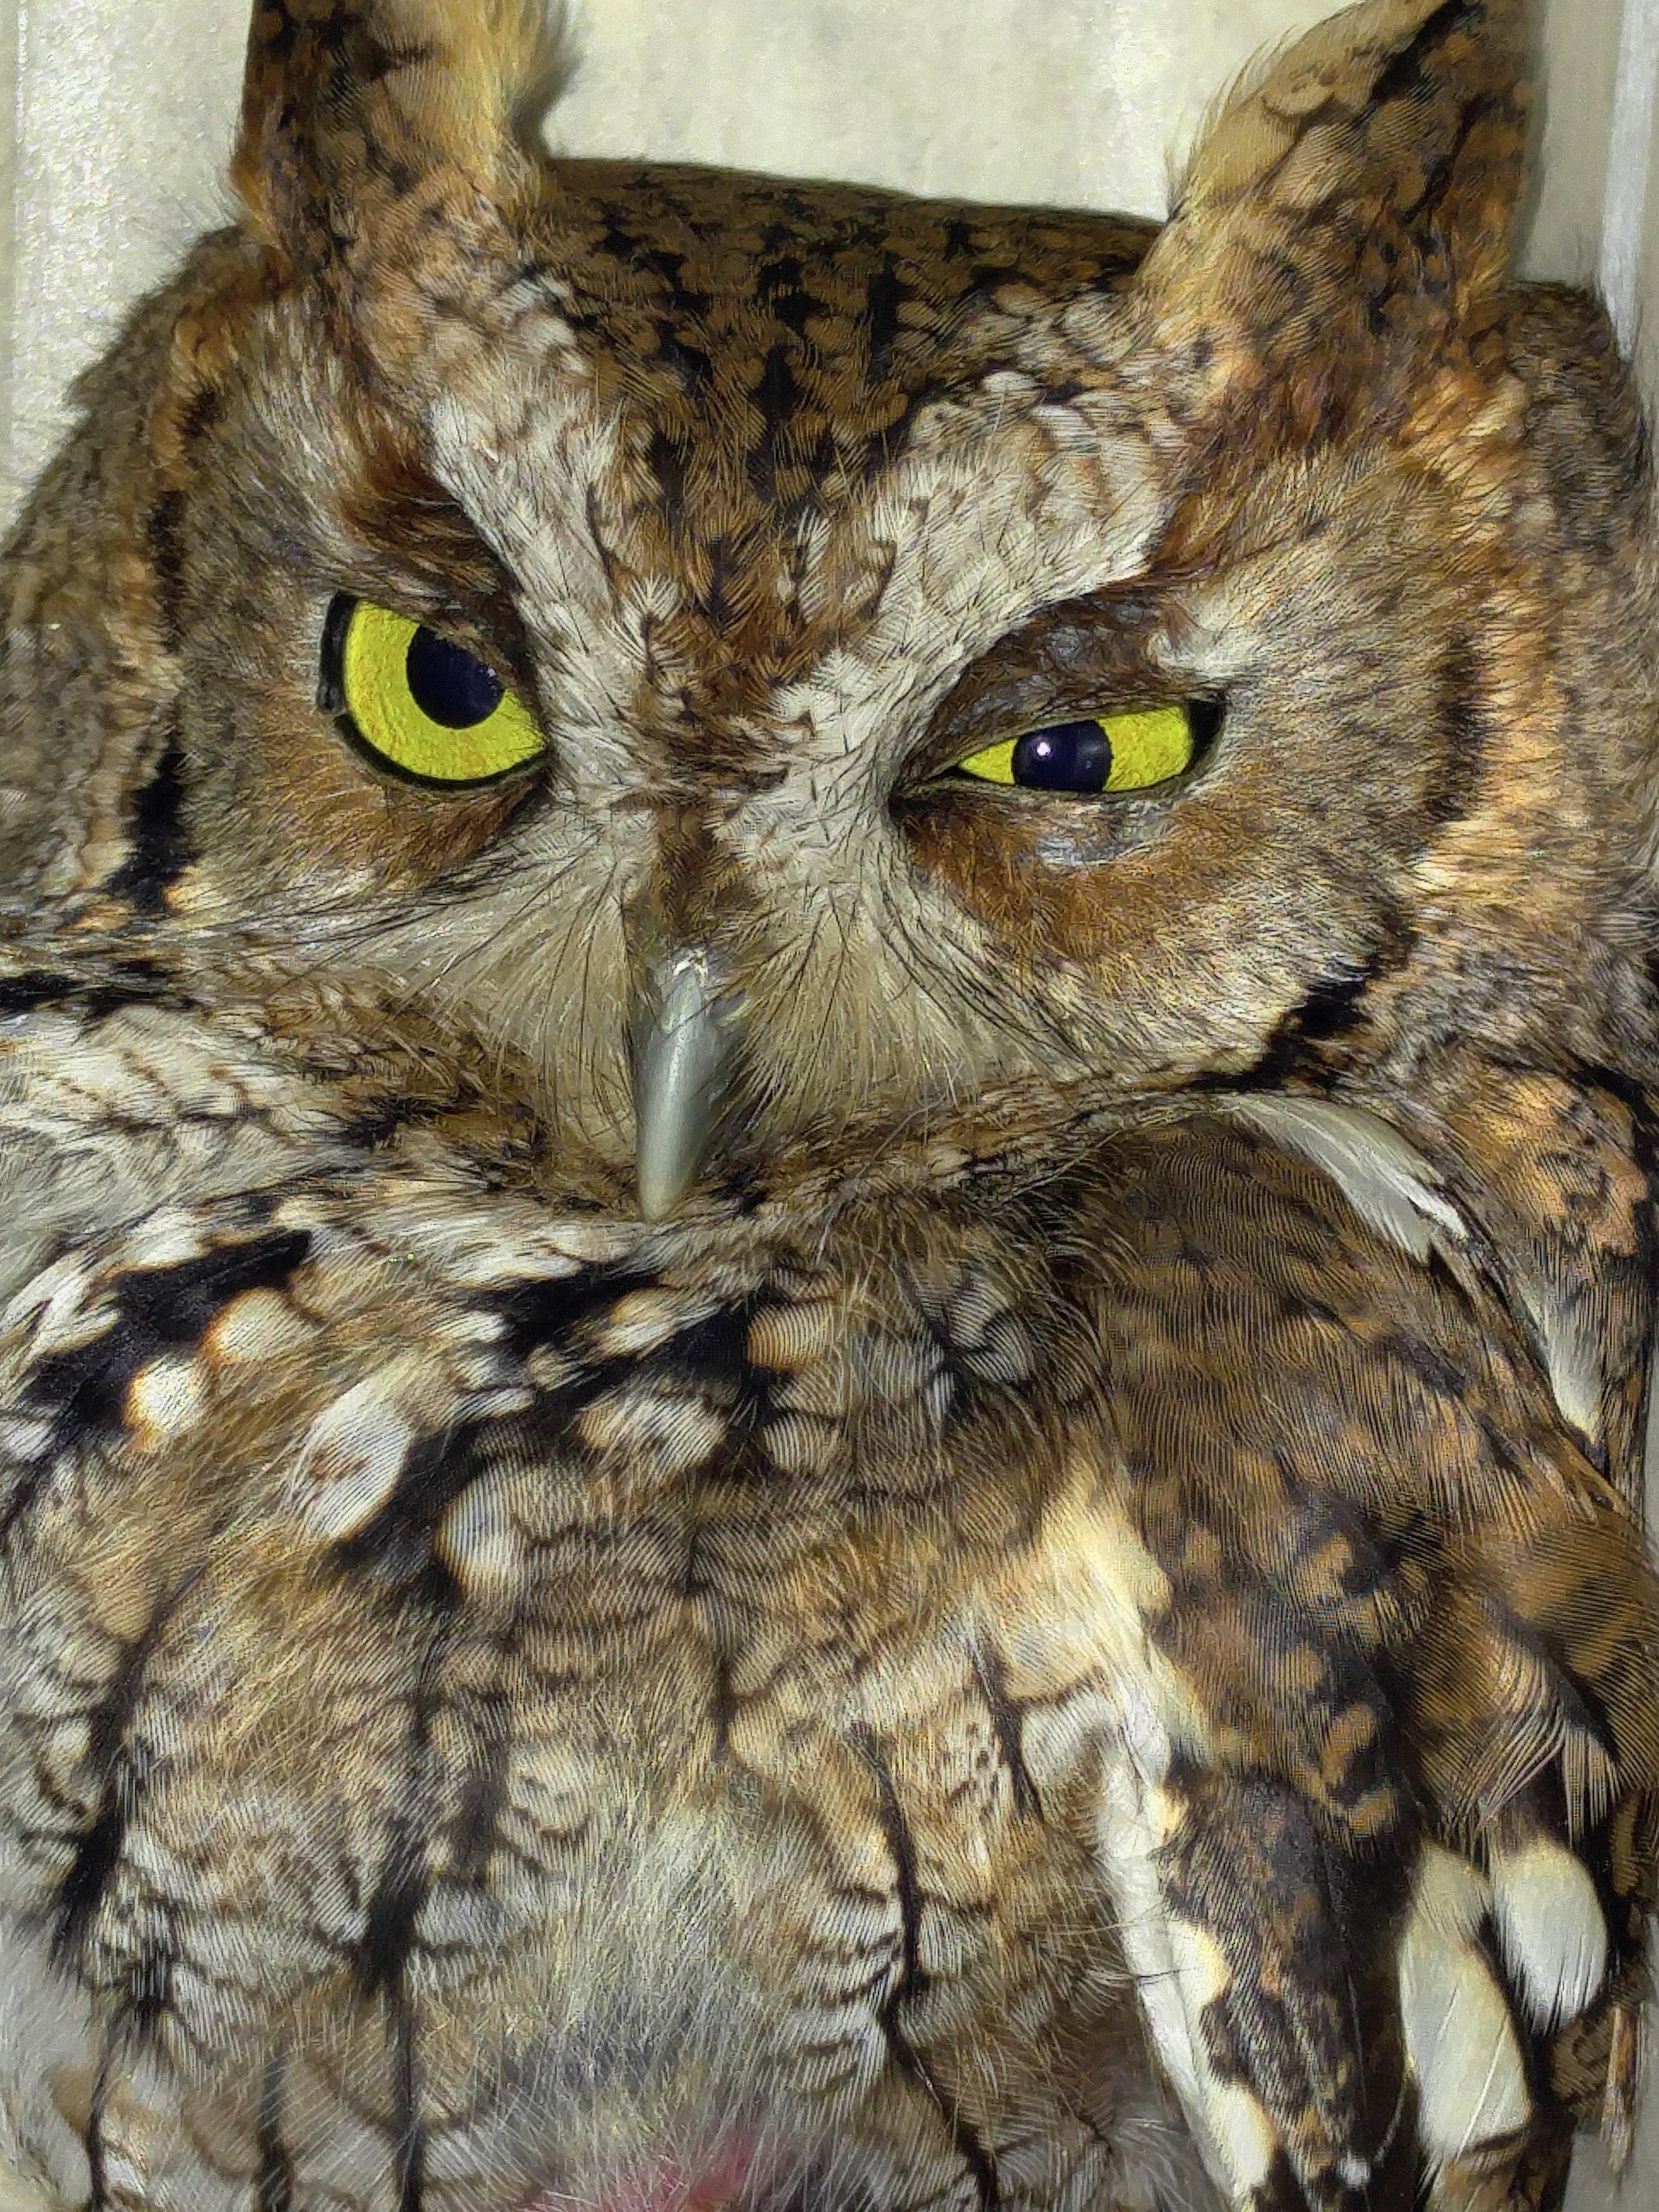 Screech owls photo